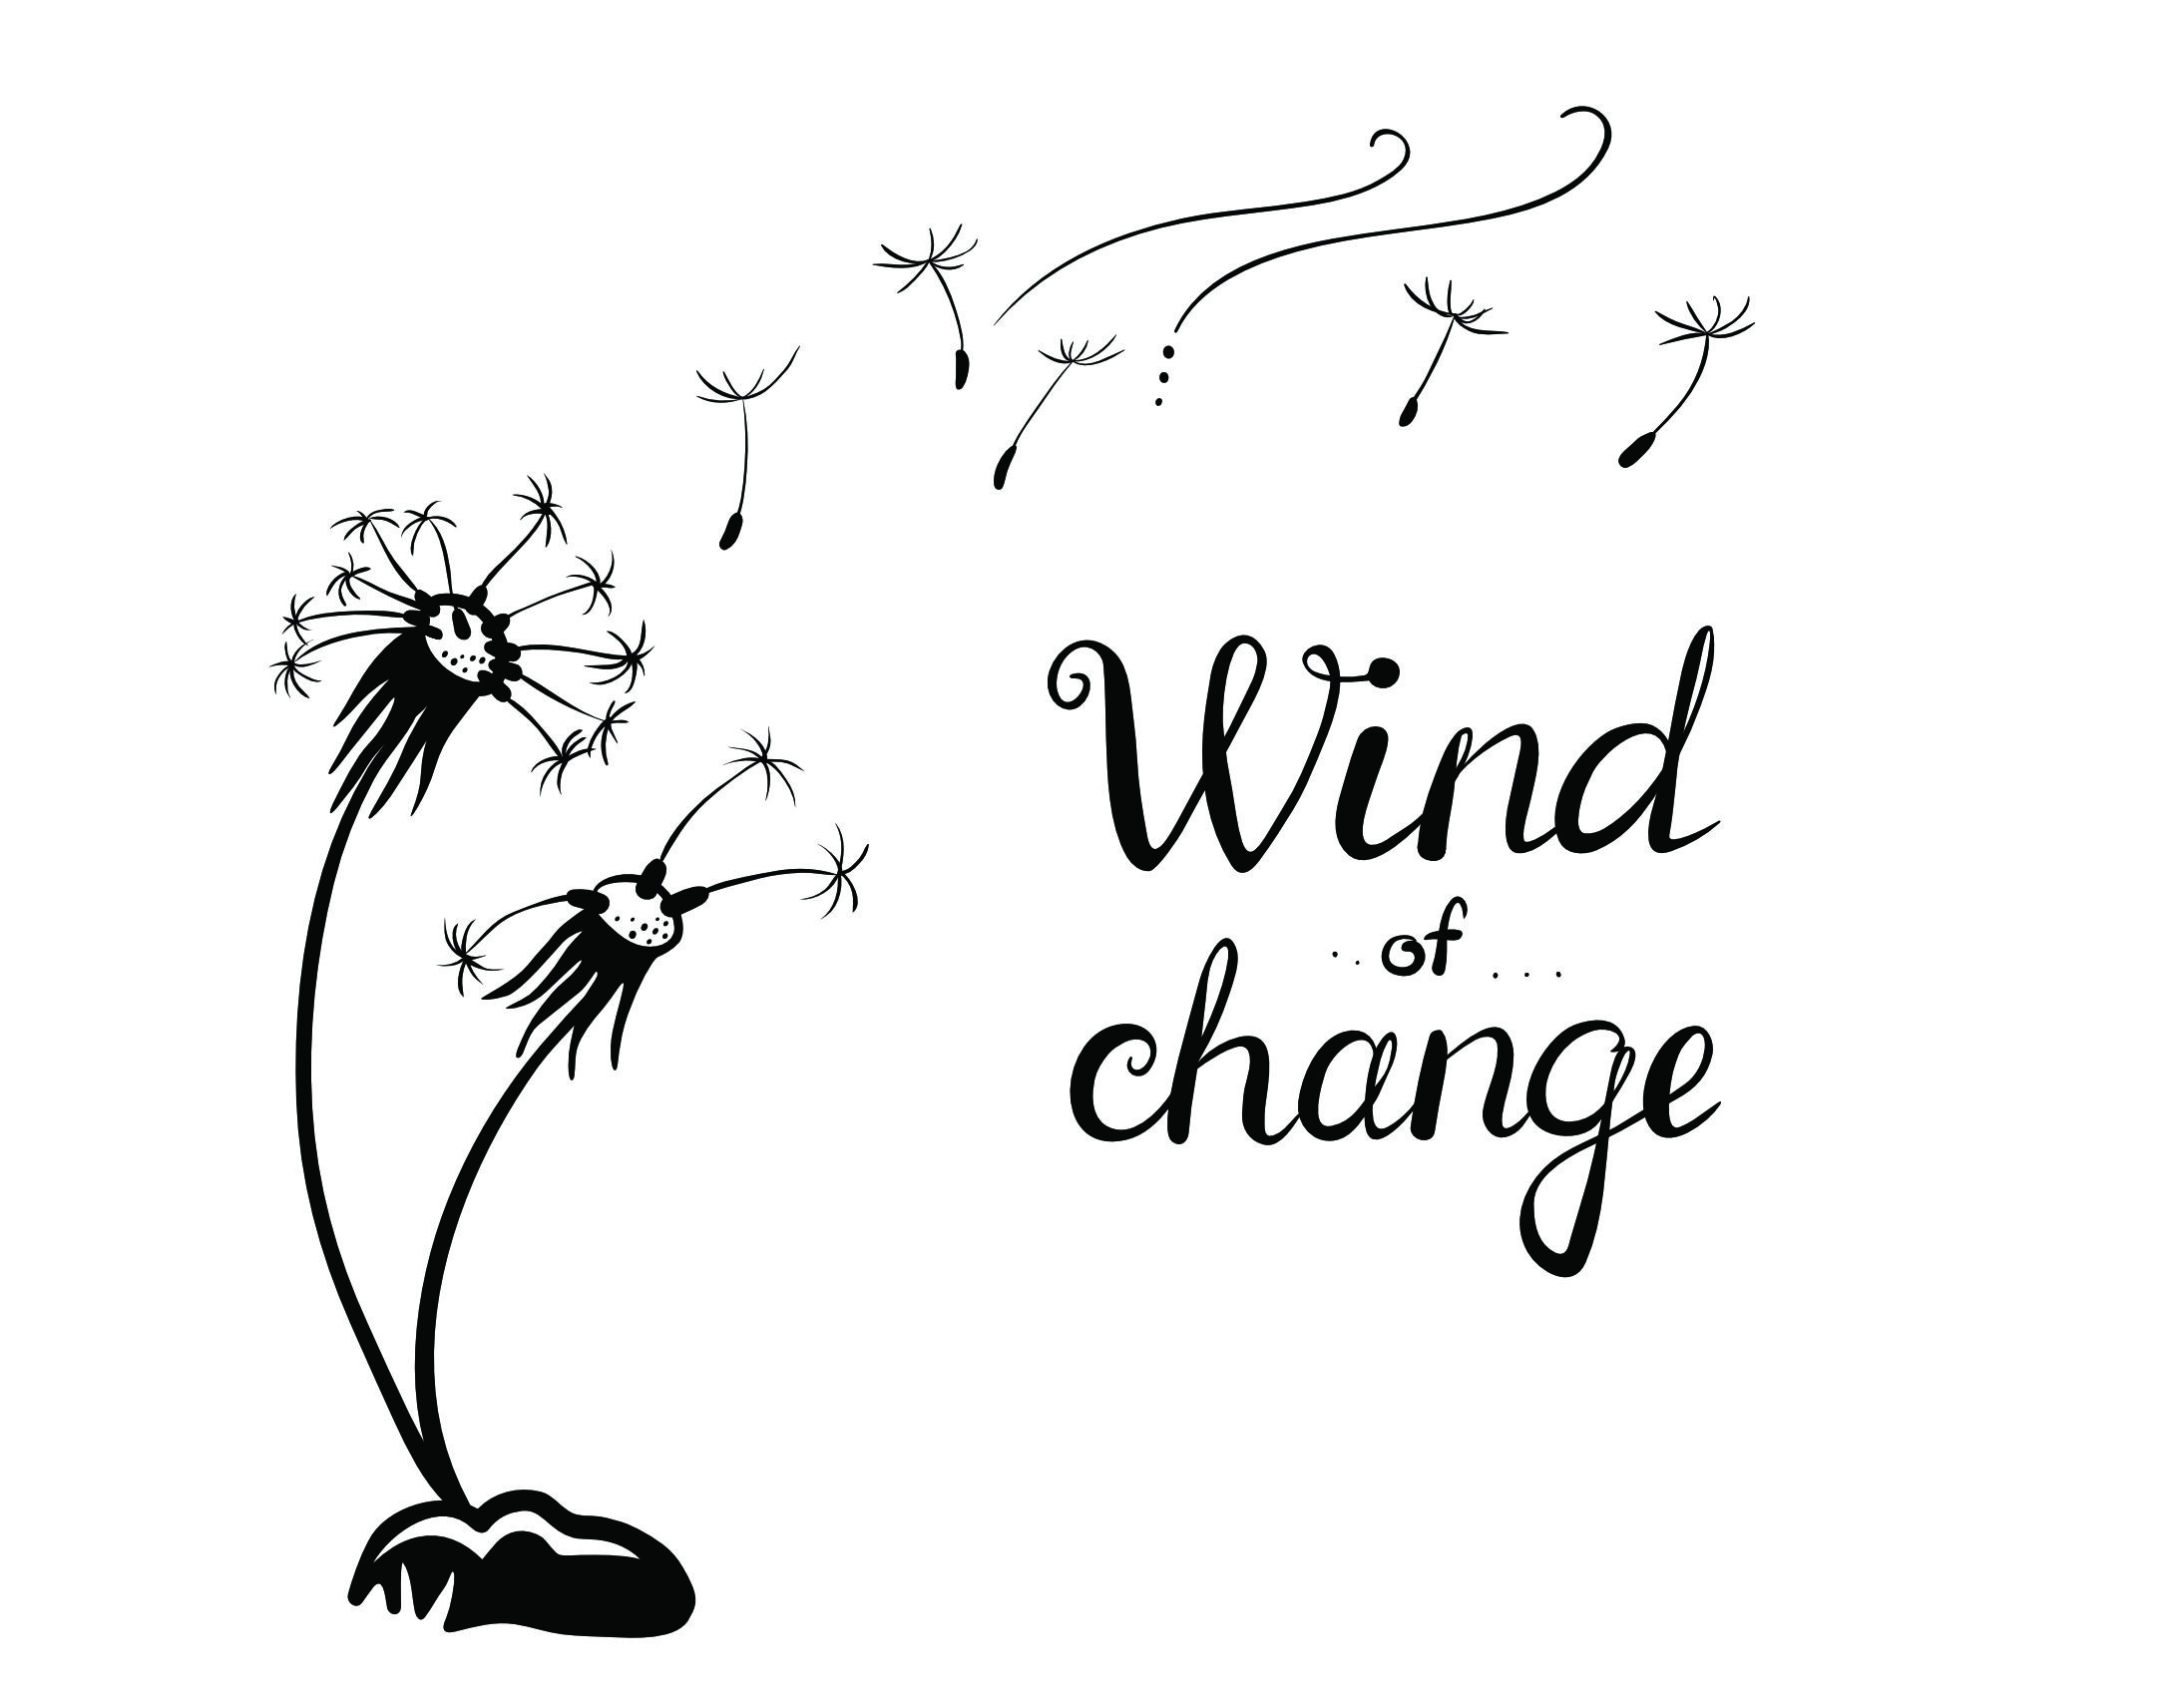 AdobeStock_106425572 wind of change 2.jpg